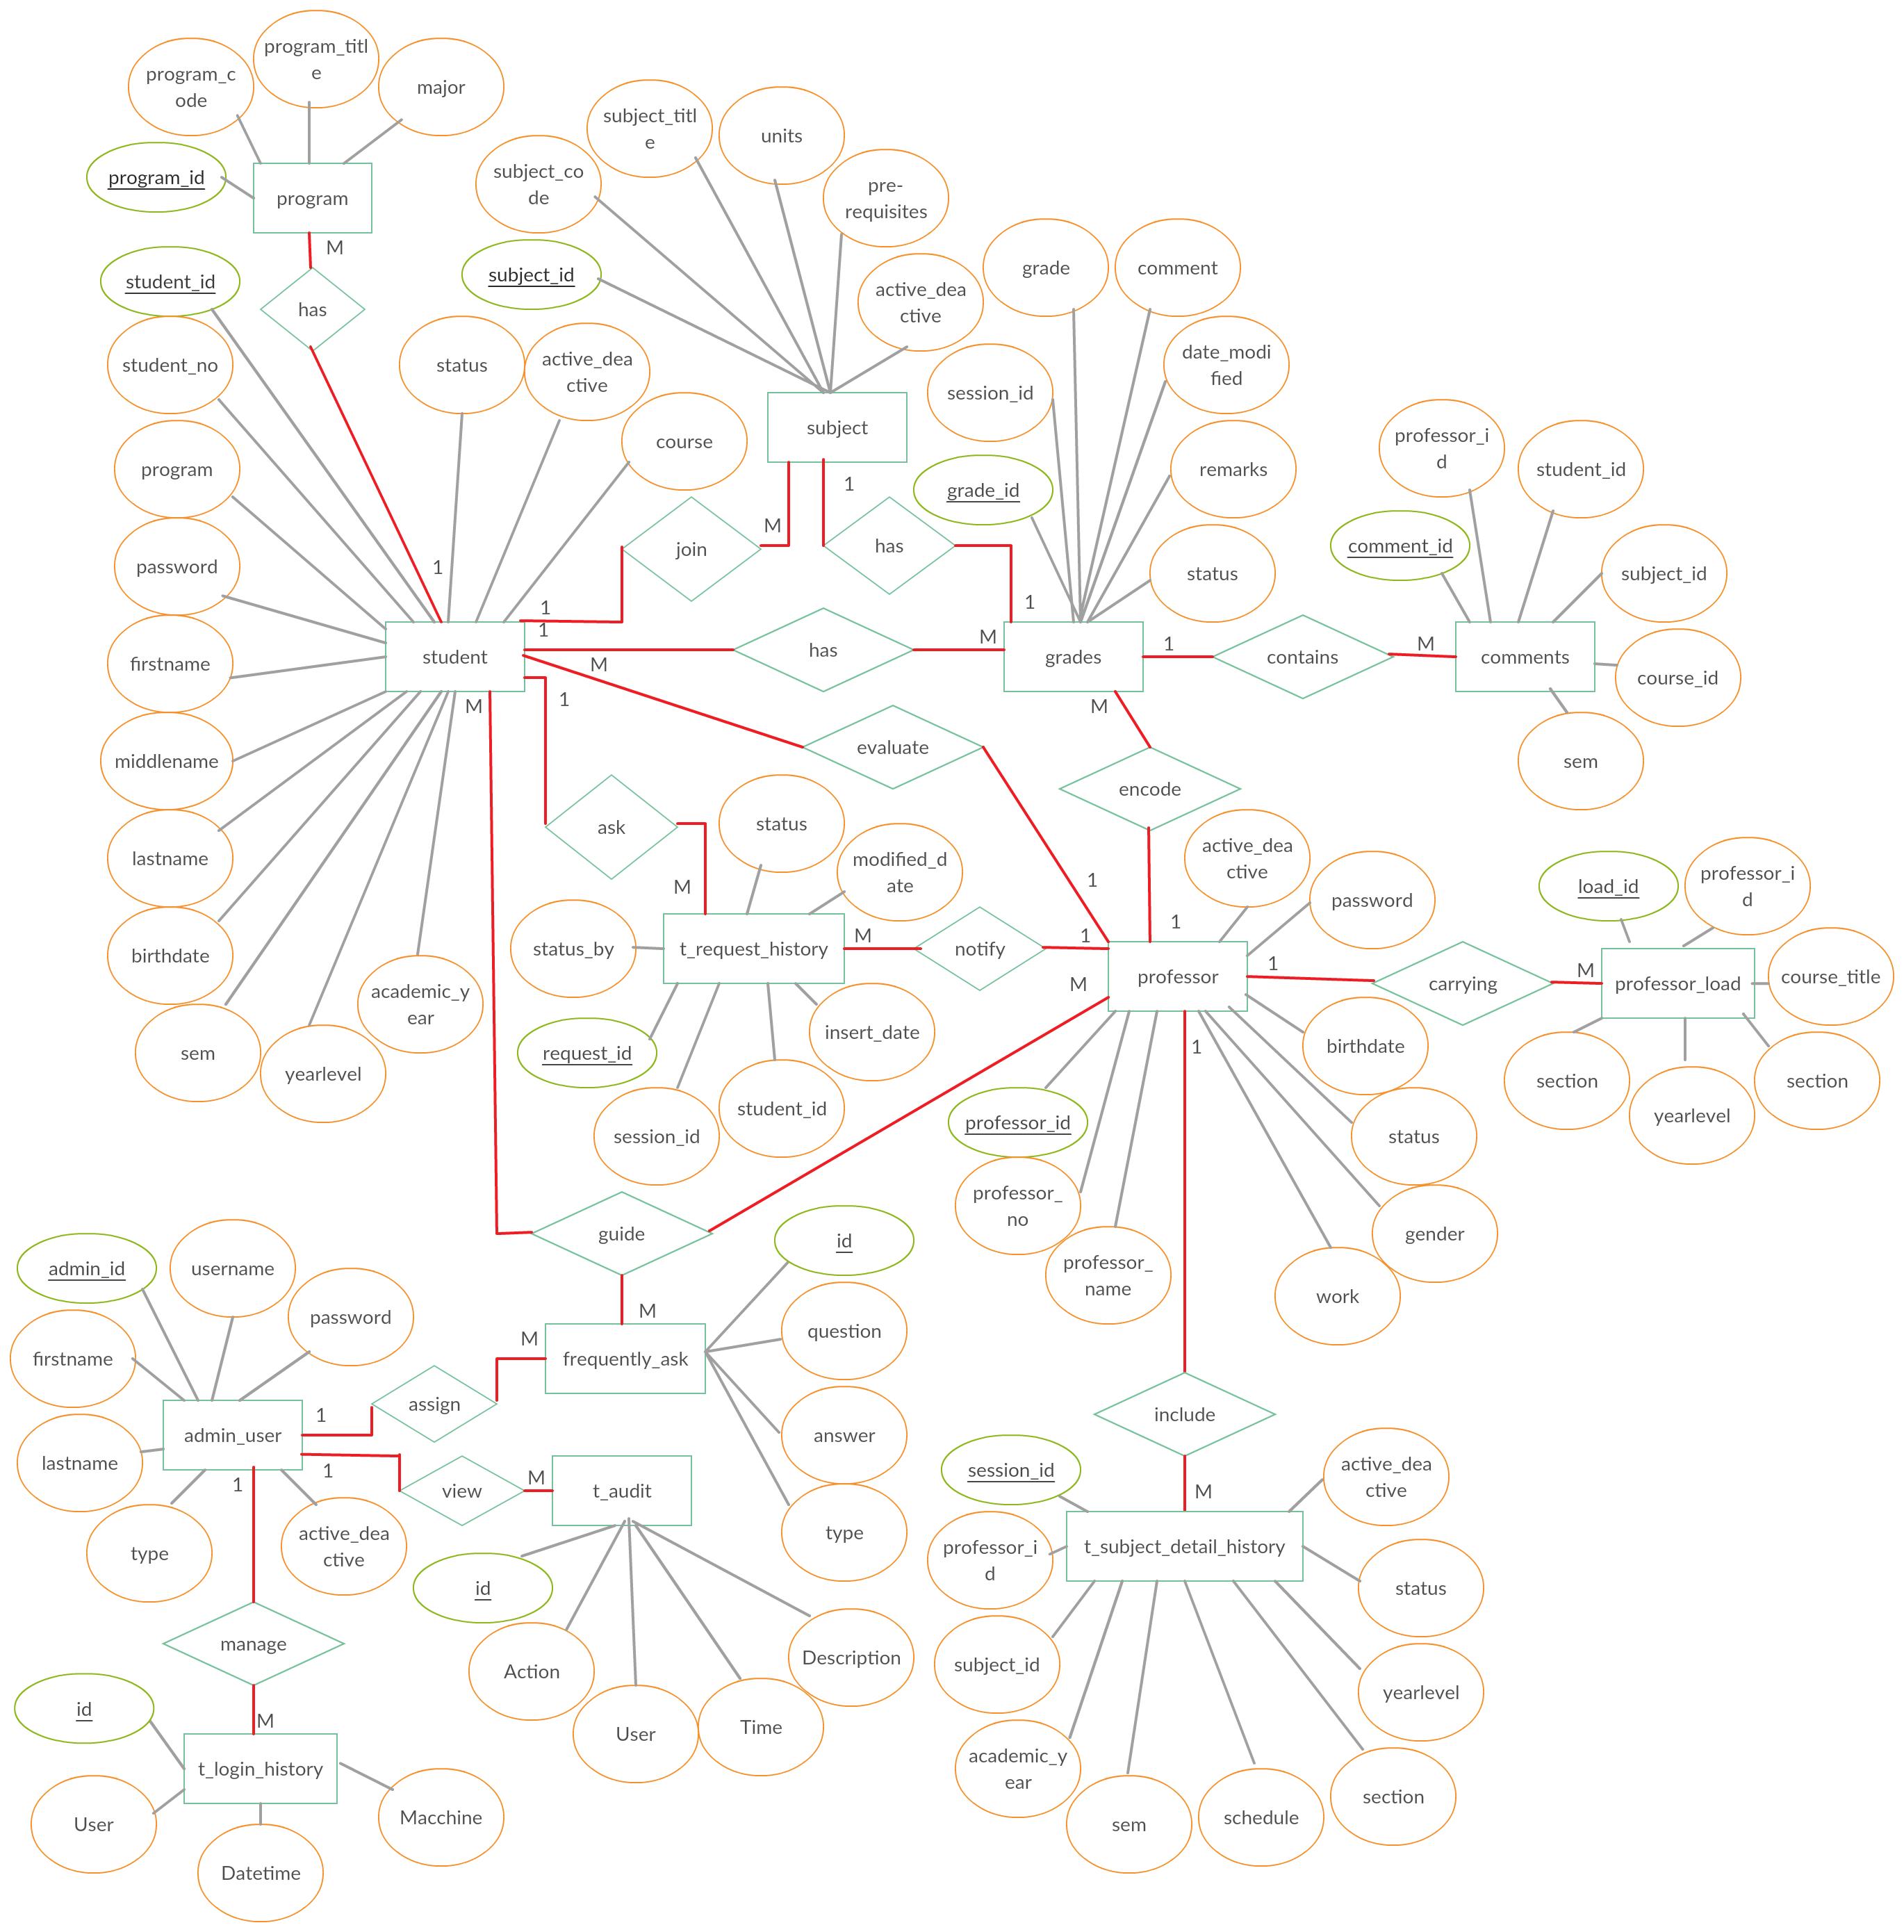 Entity Relationship Diagram (Er Diagram) Of Online Student regarding Chen Er Diagram